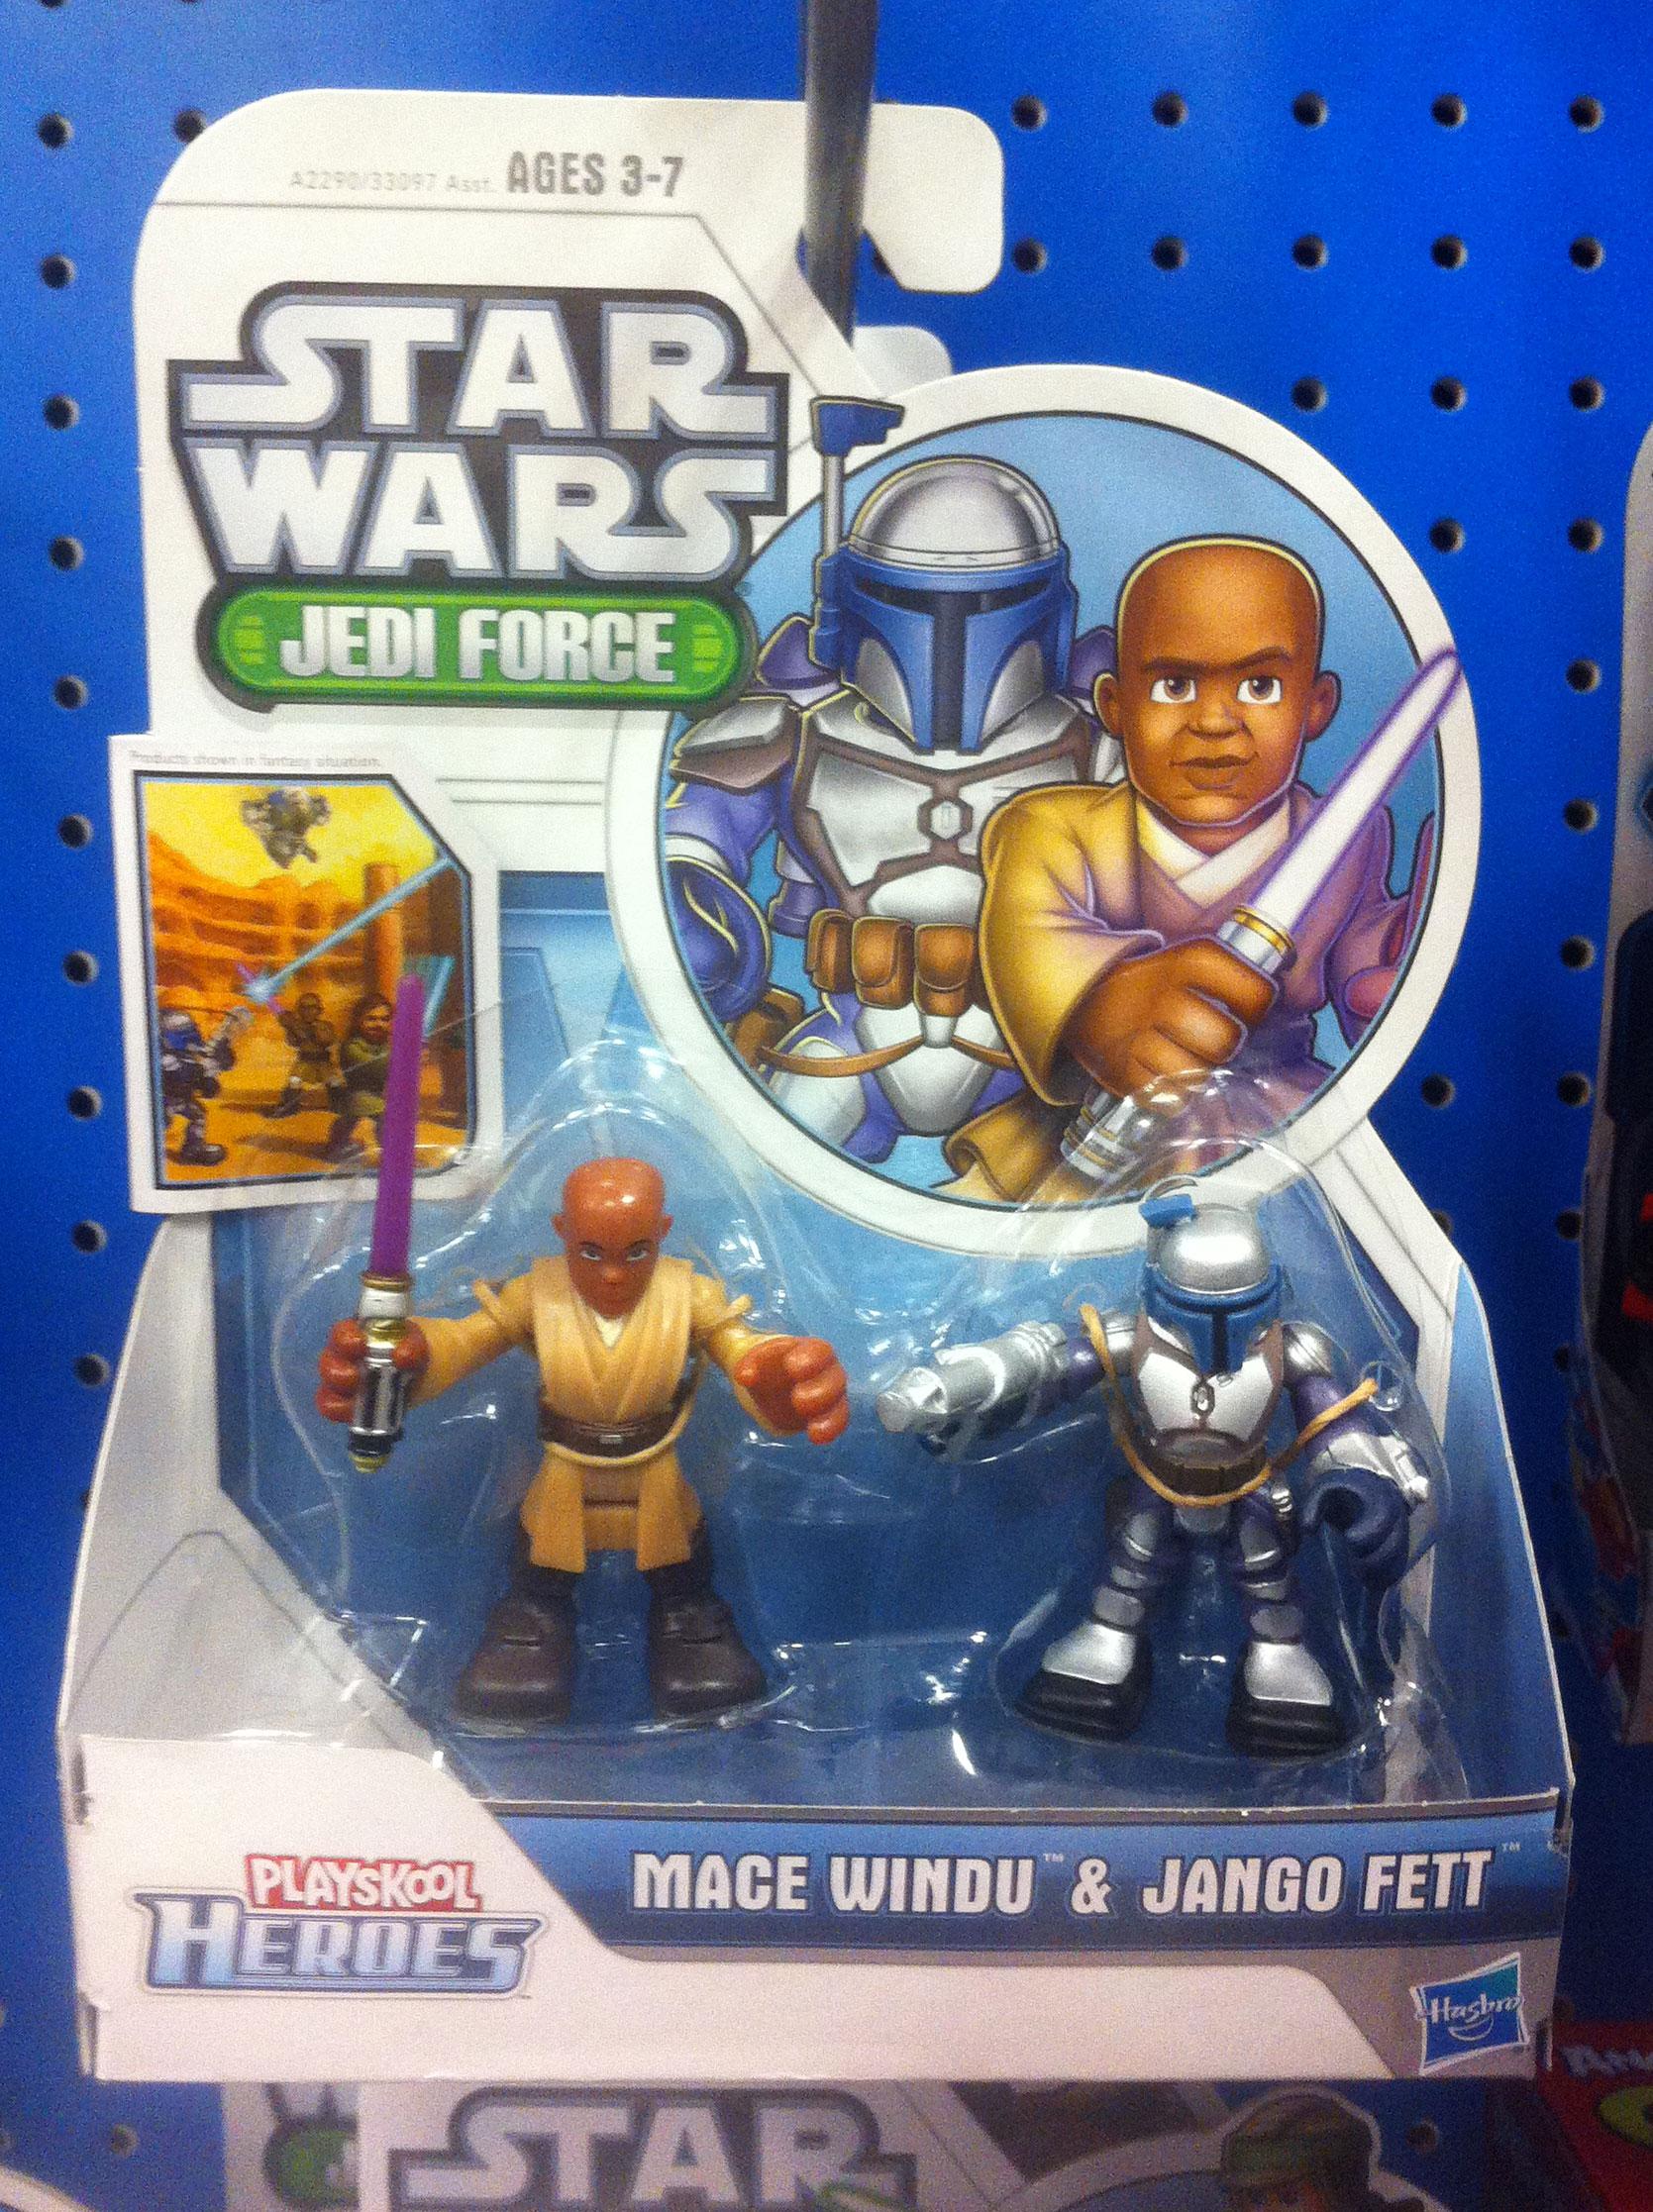 Playskool Heroes Jedi Force Mace Windu and Jango Fett (2014)